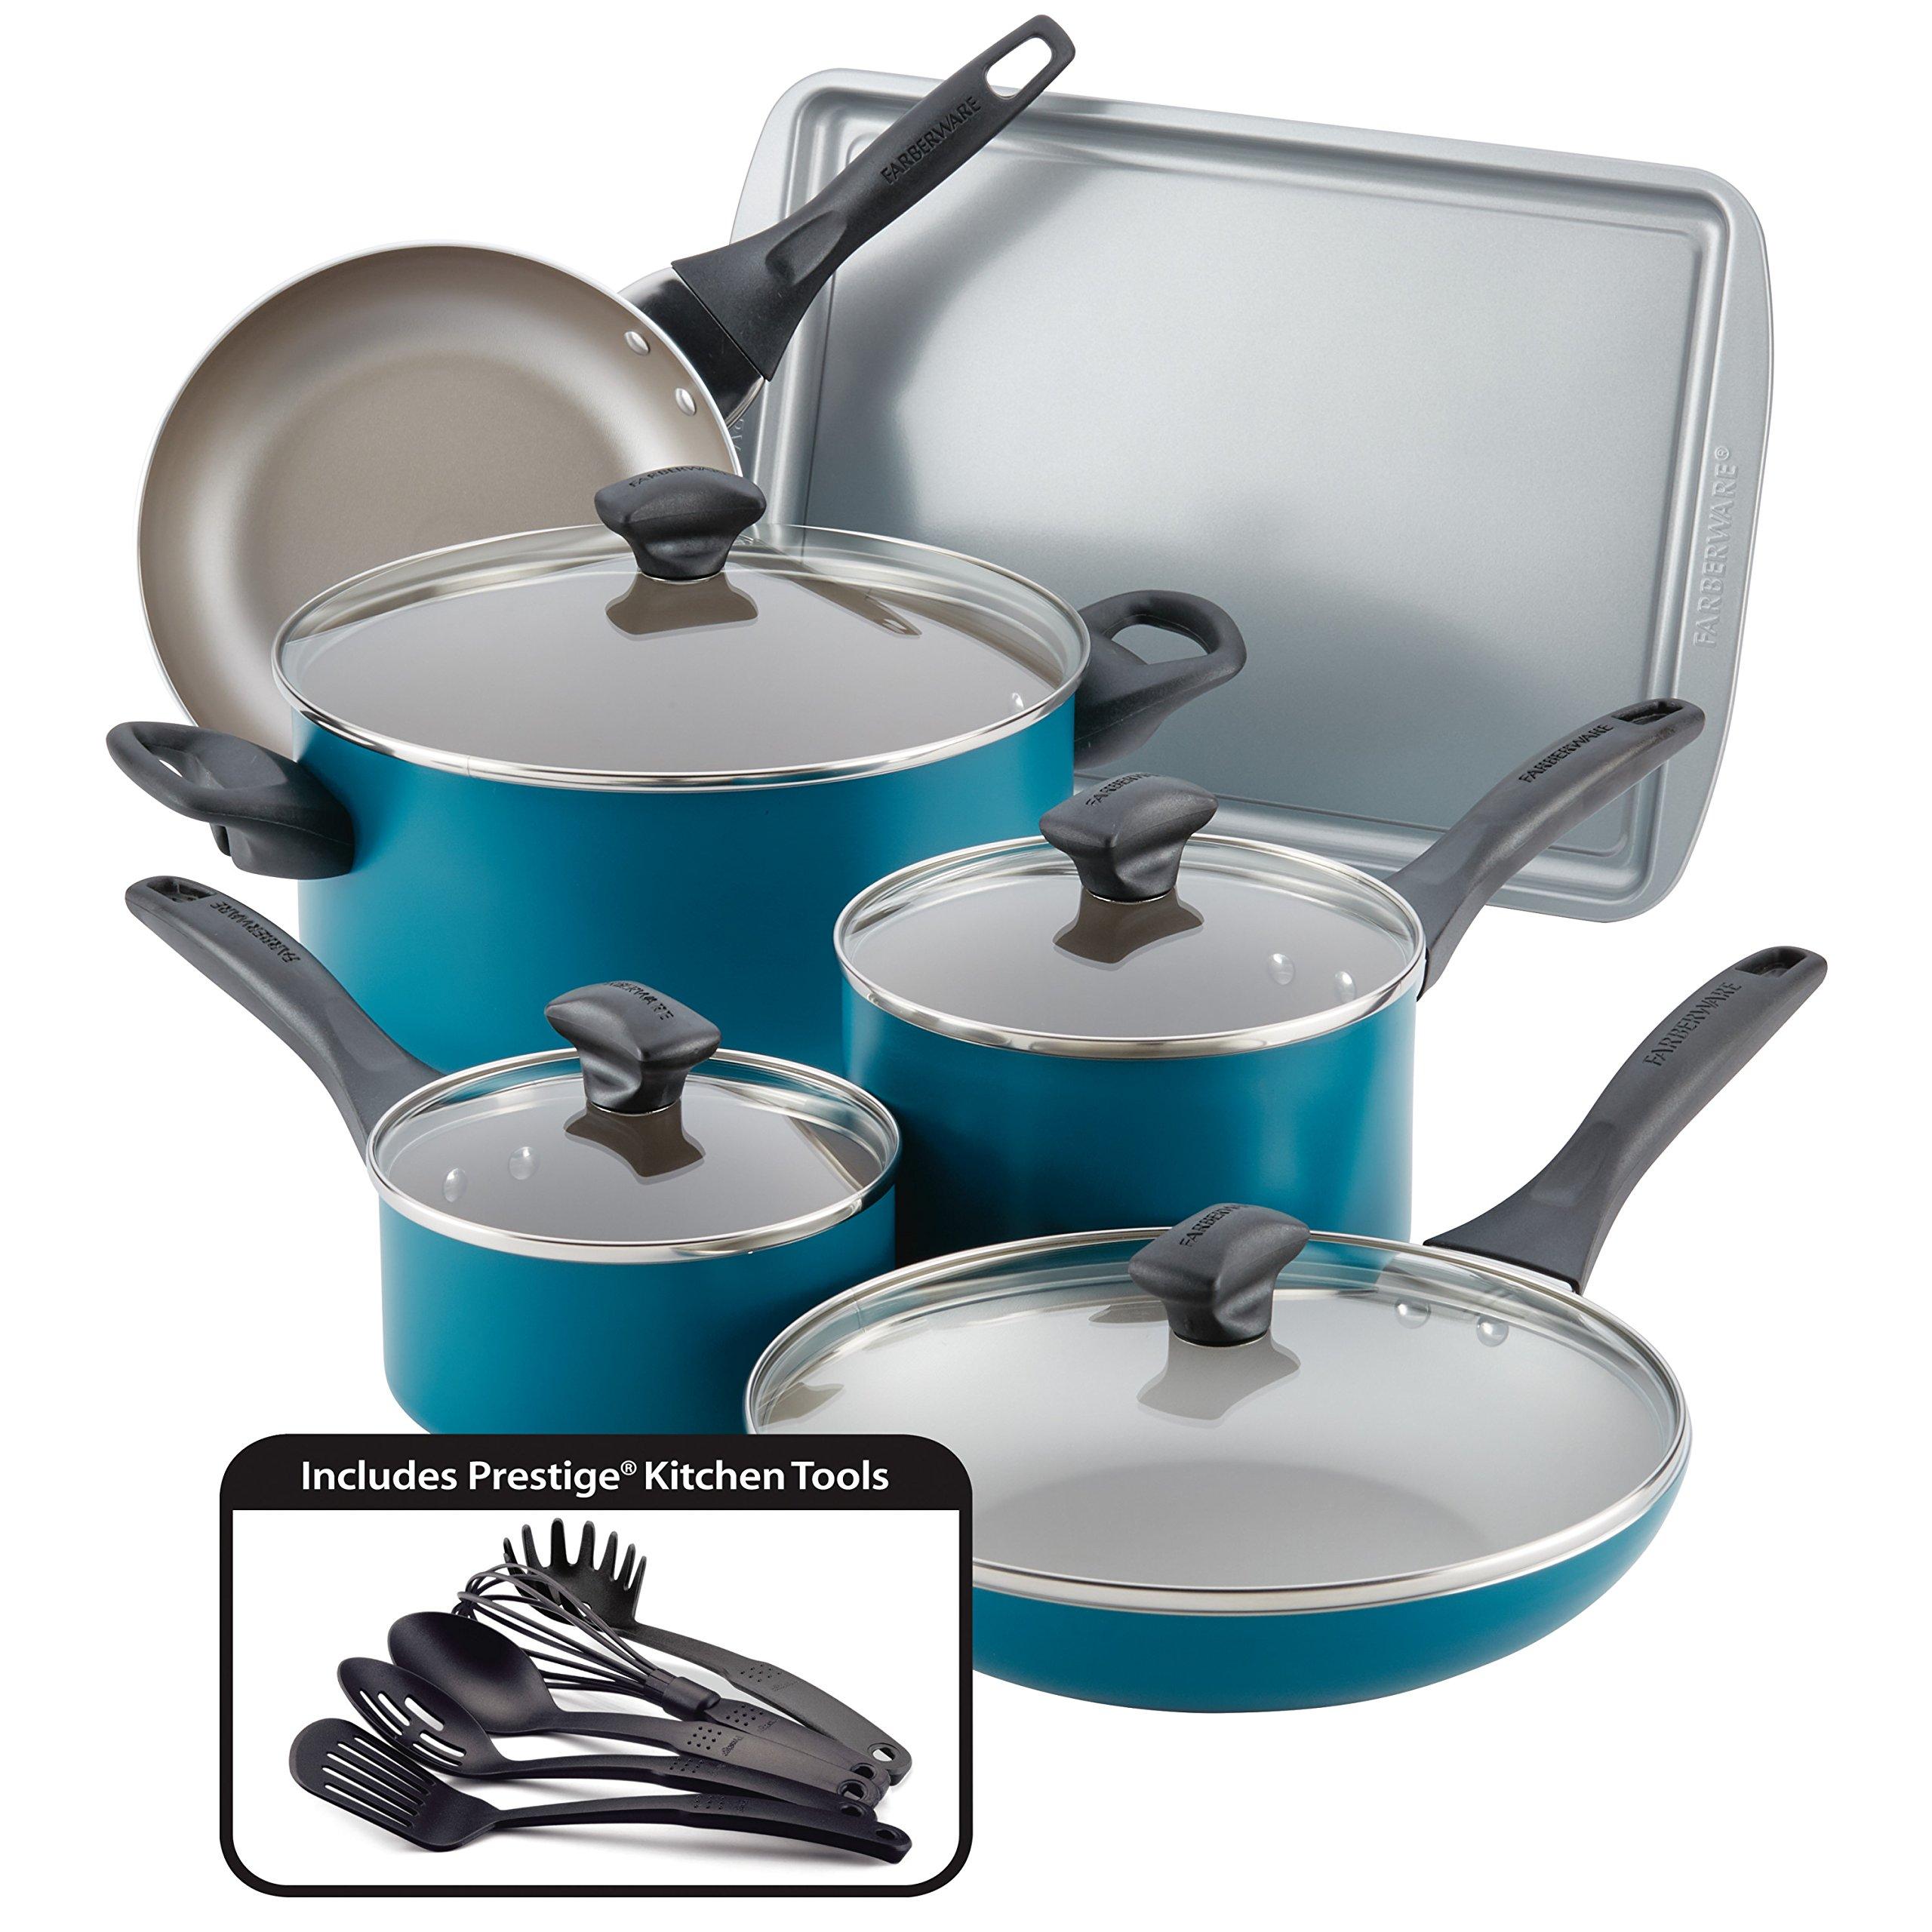 Farberware 20361 Nonstick Cookware Set, Large, Teal